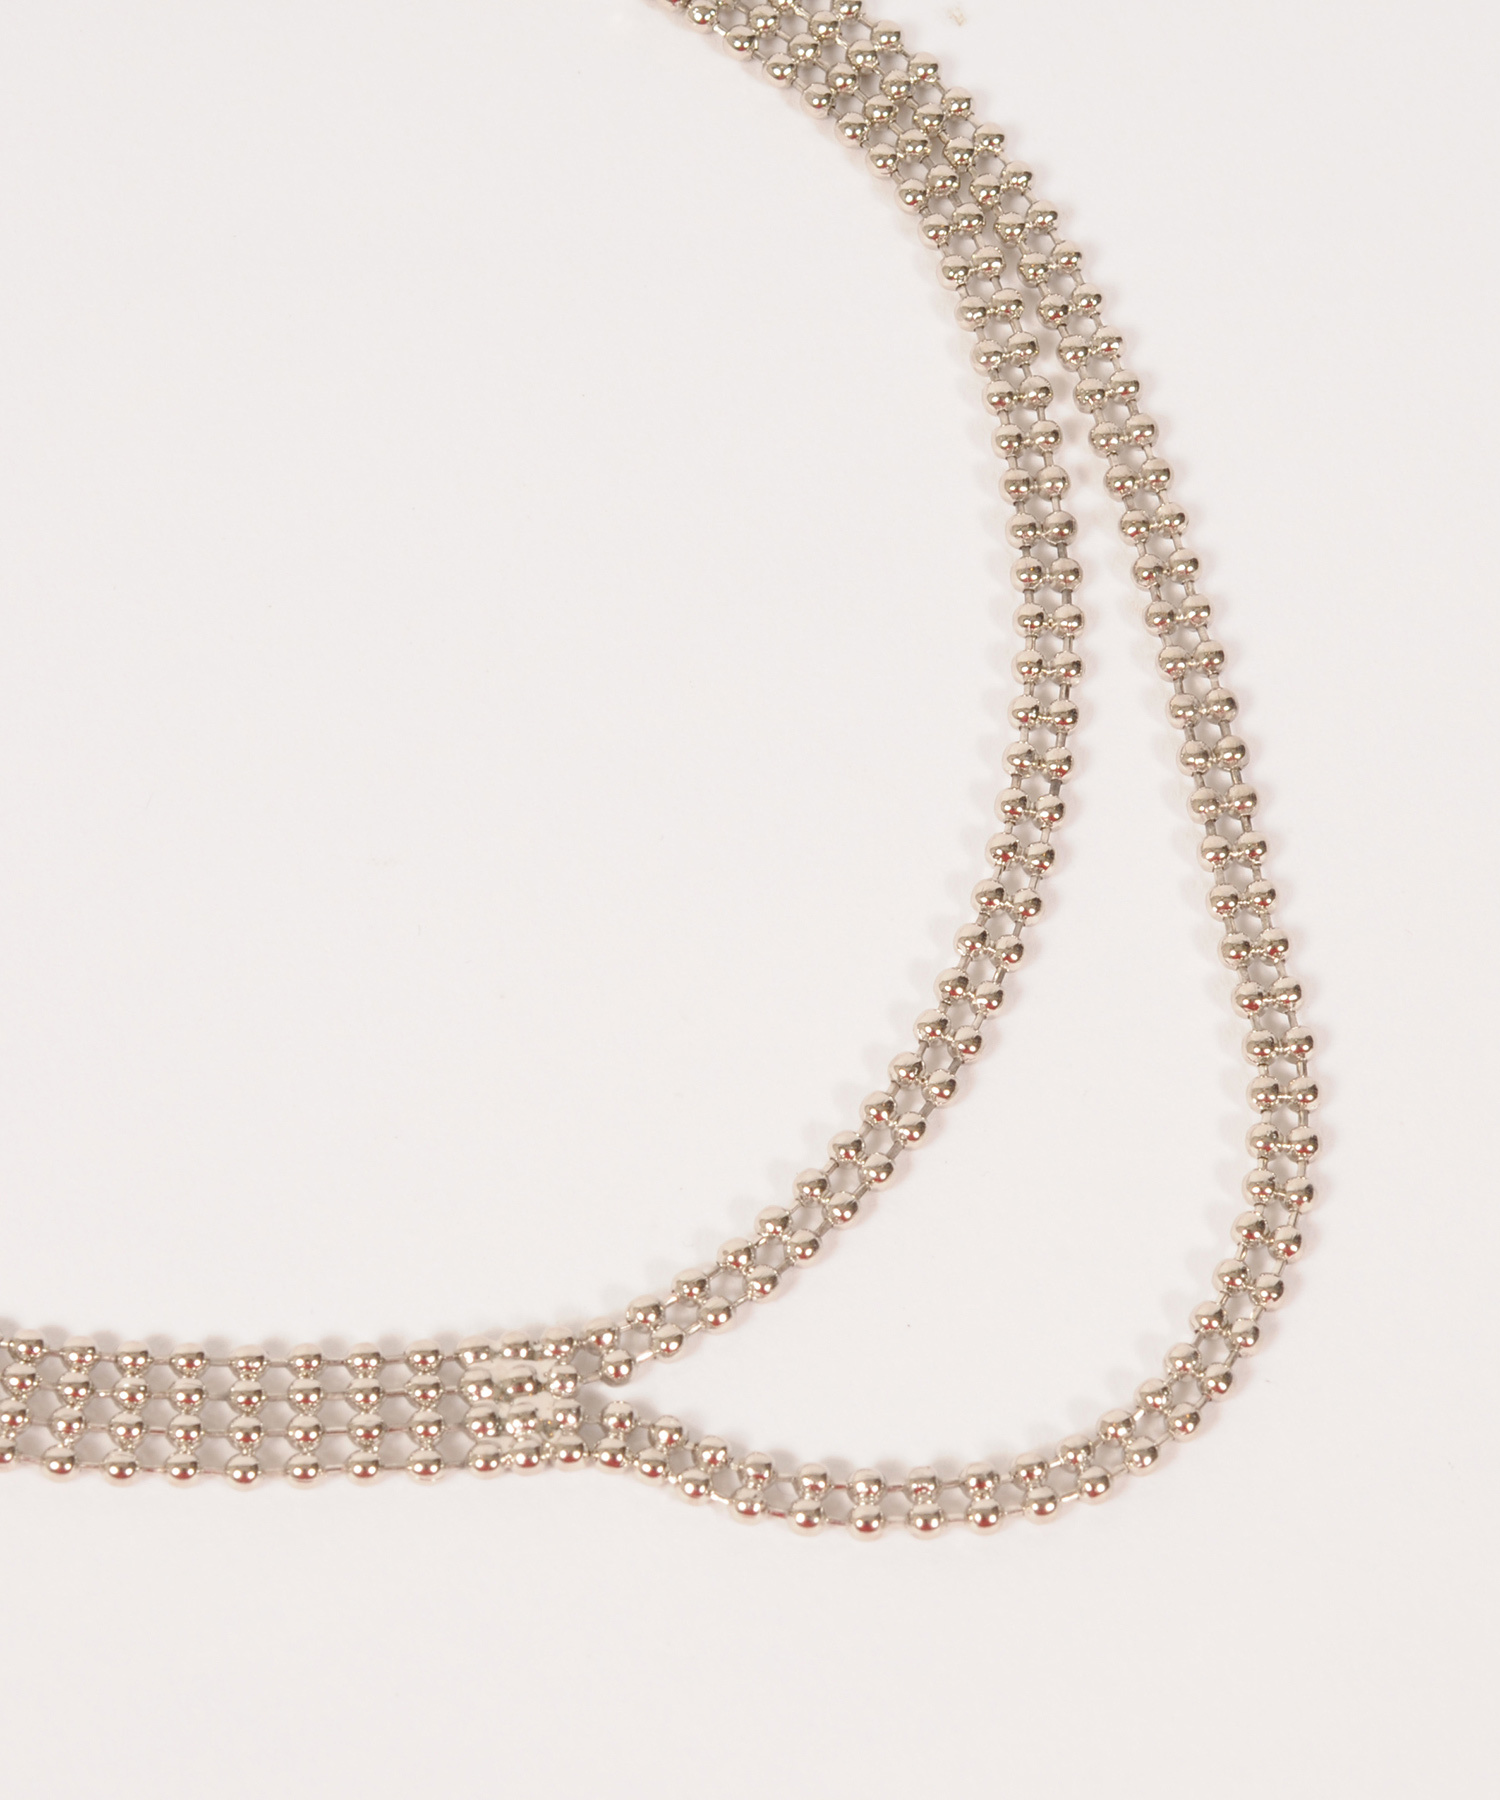 df19AW-J19 BALLCHAIN NECKLACE (silver)